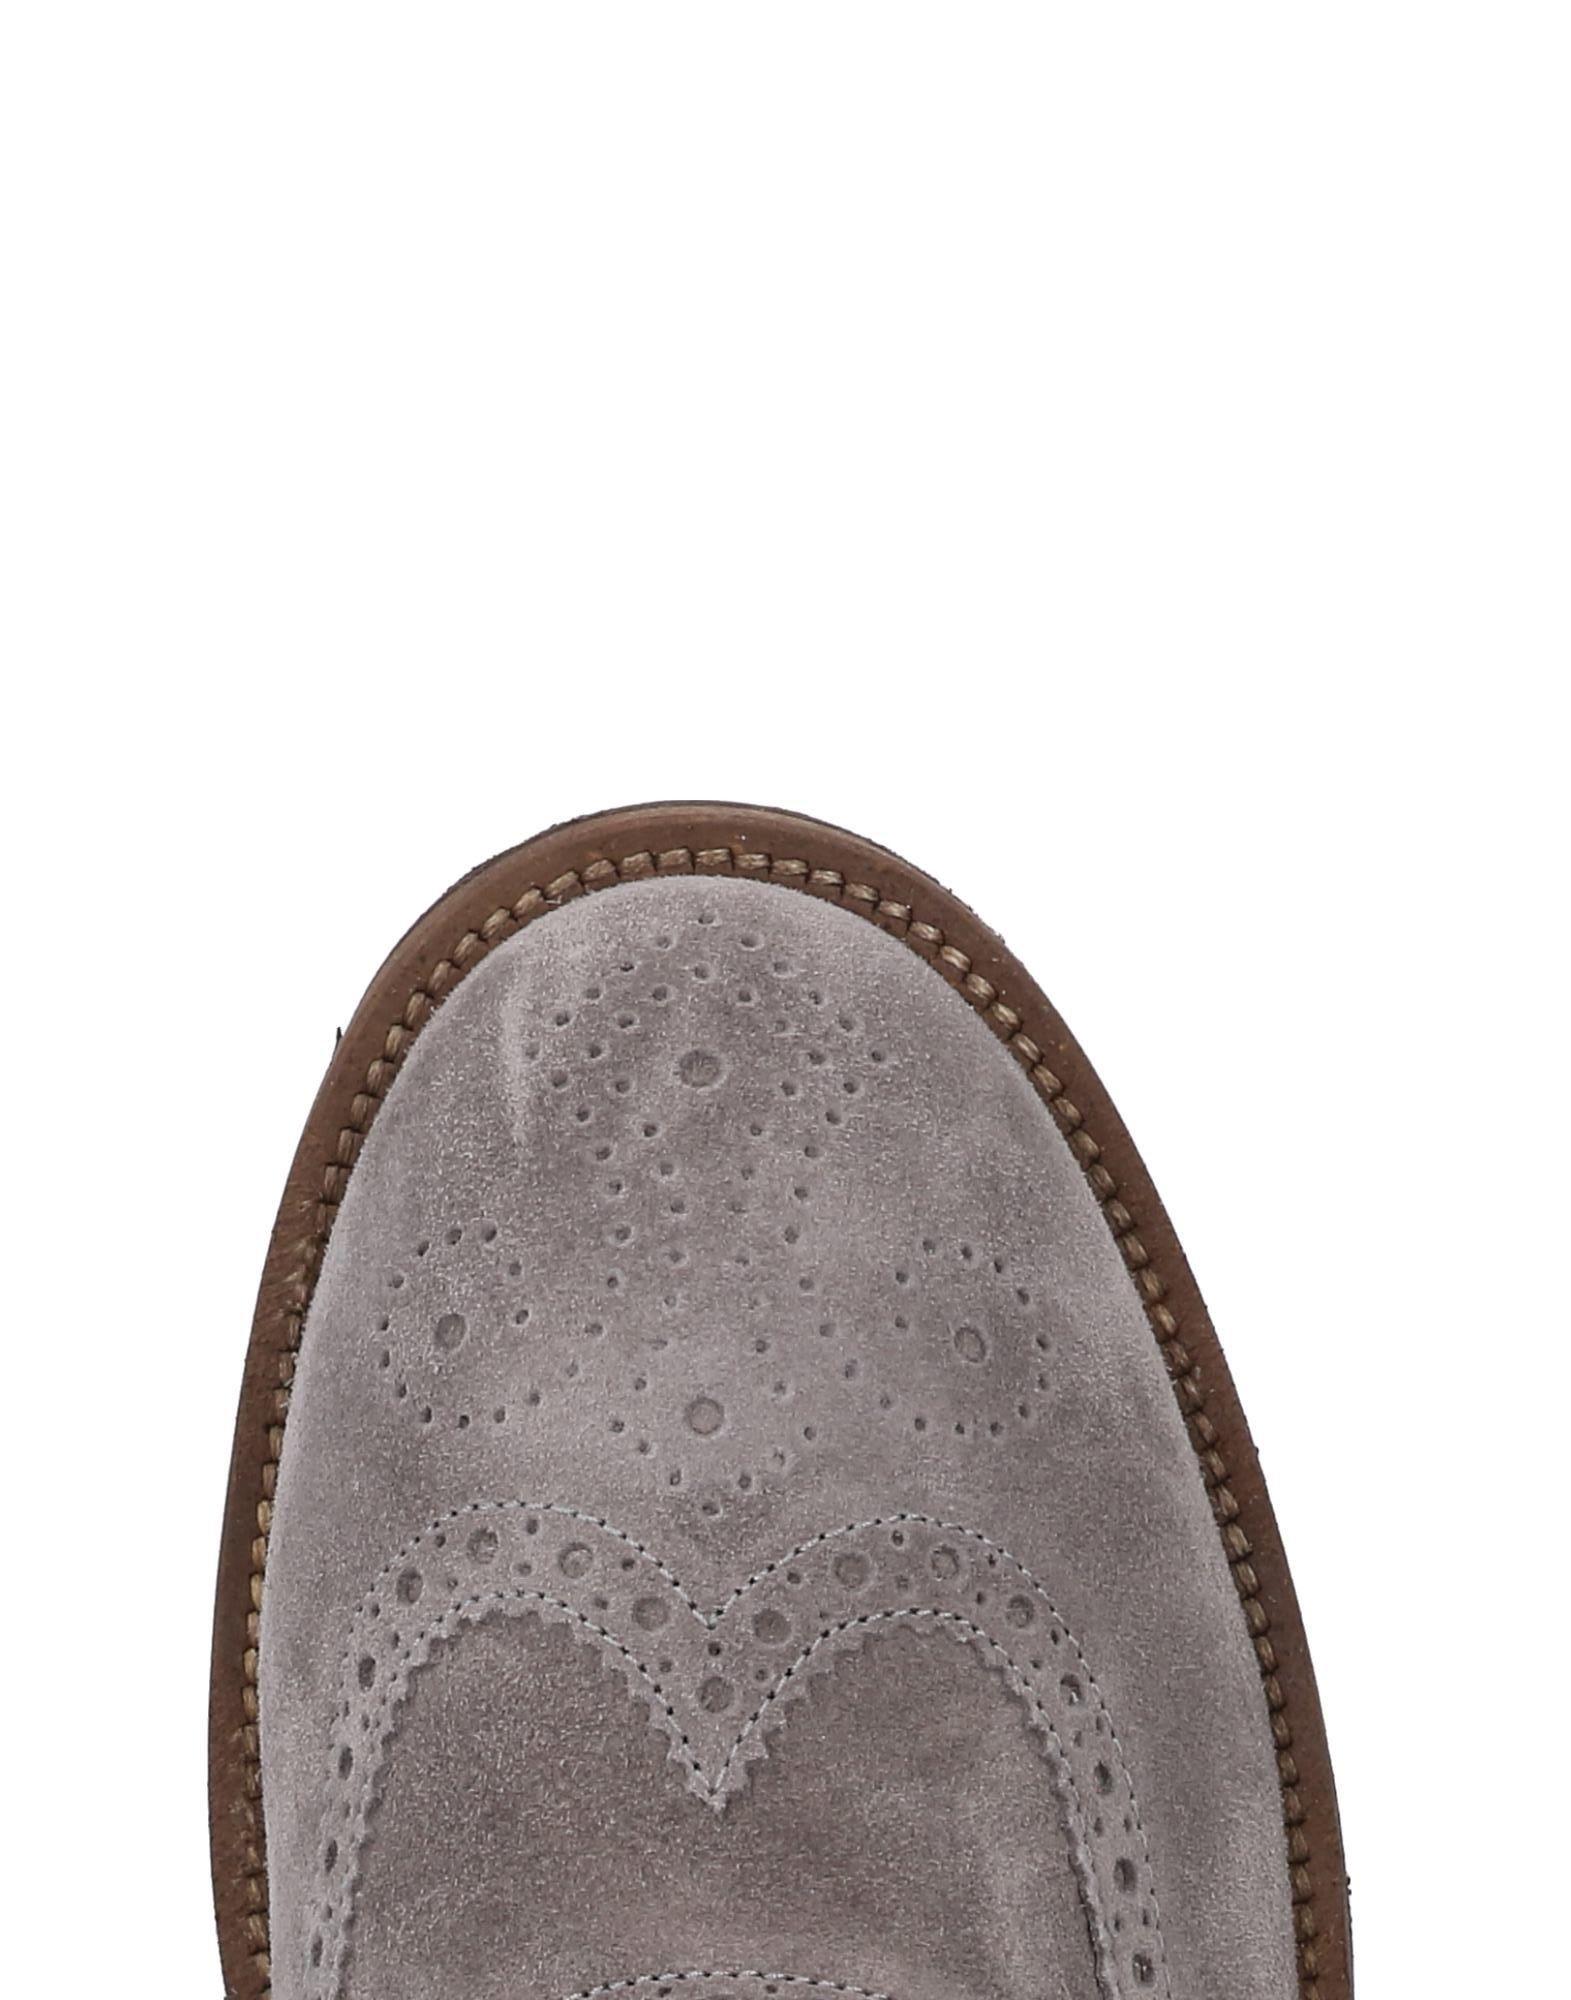 Rabatt echte Schuhe Herren Snobs® Schnürschuhe Herren Schuhe  11494352WW fcd171